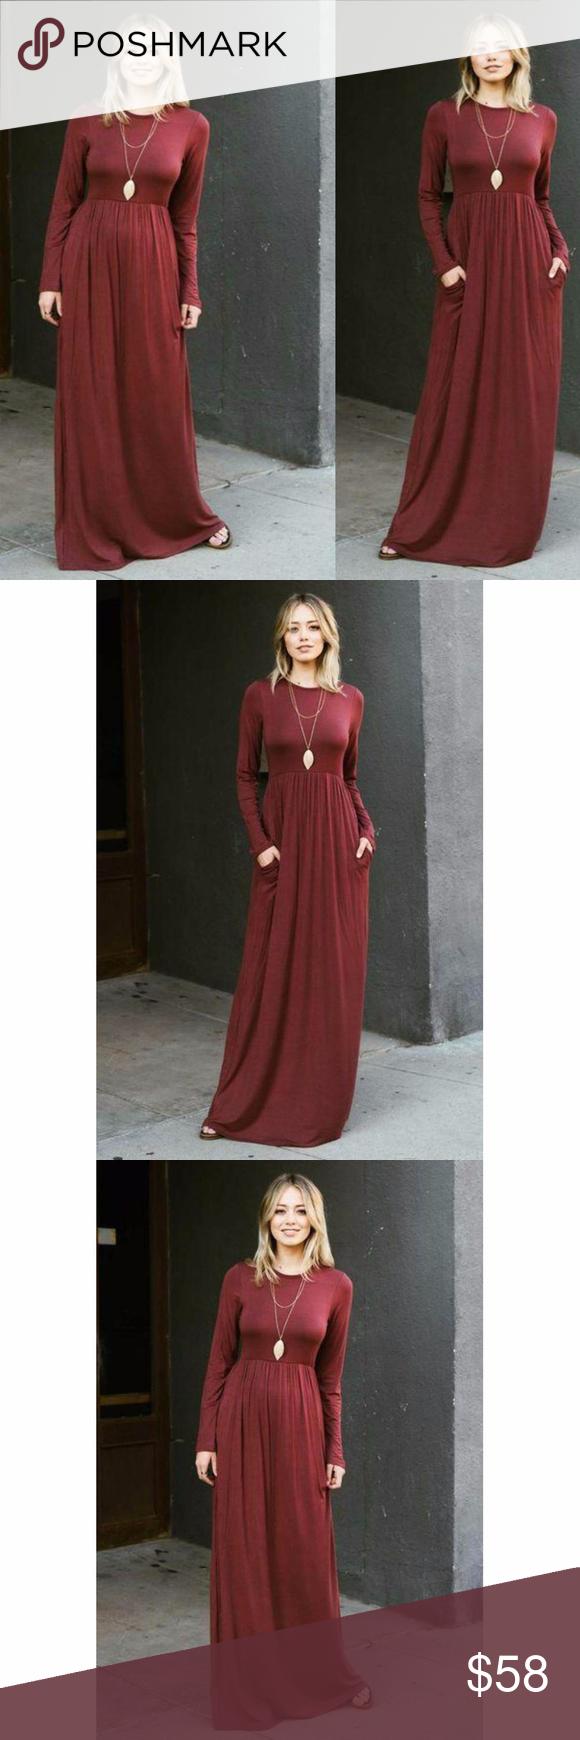 Long sleeve flowy high waist maxi dress boutique boutique dresses